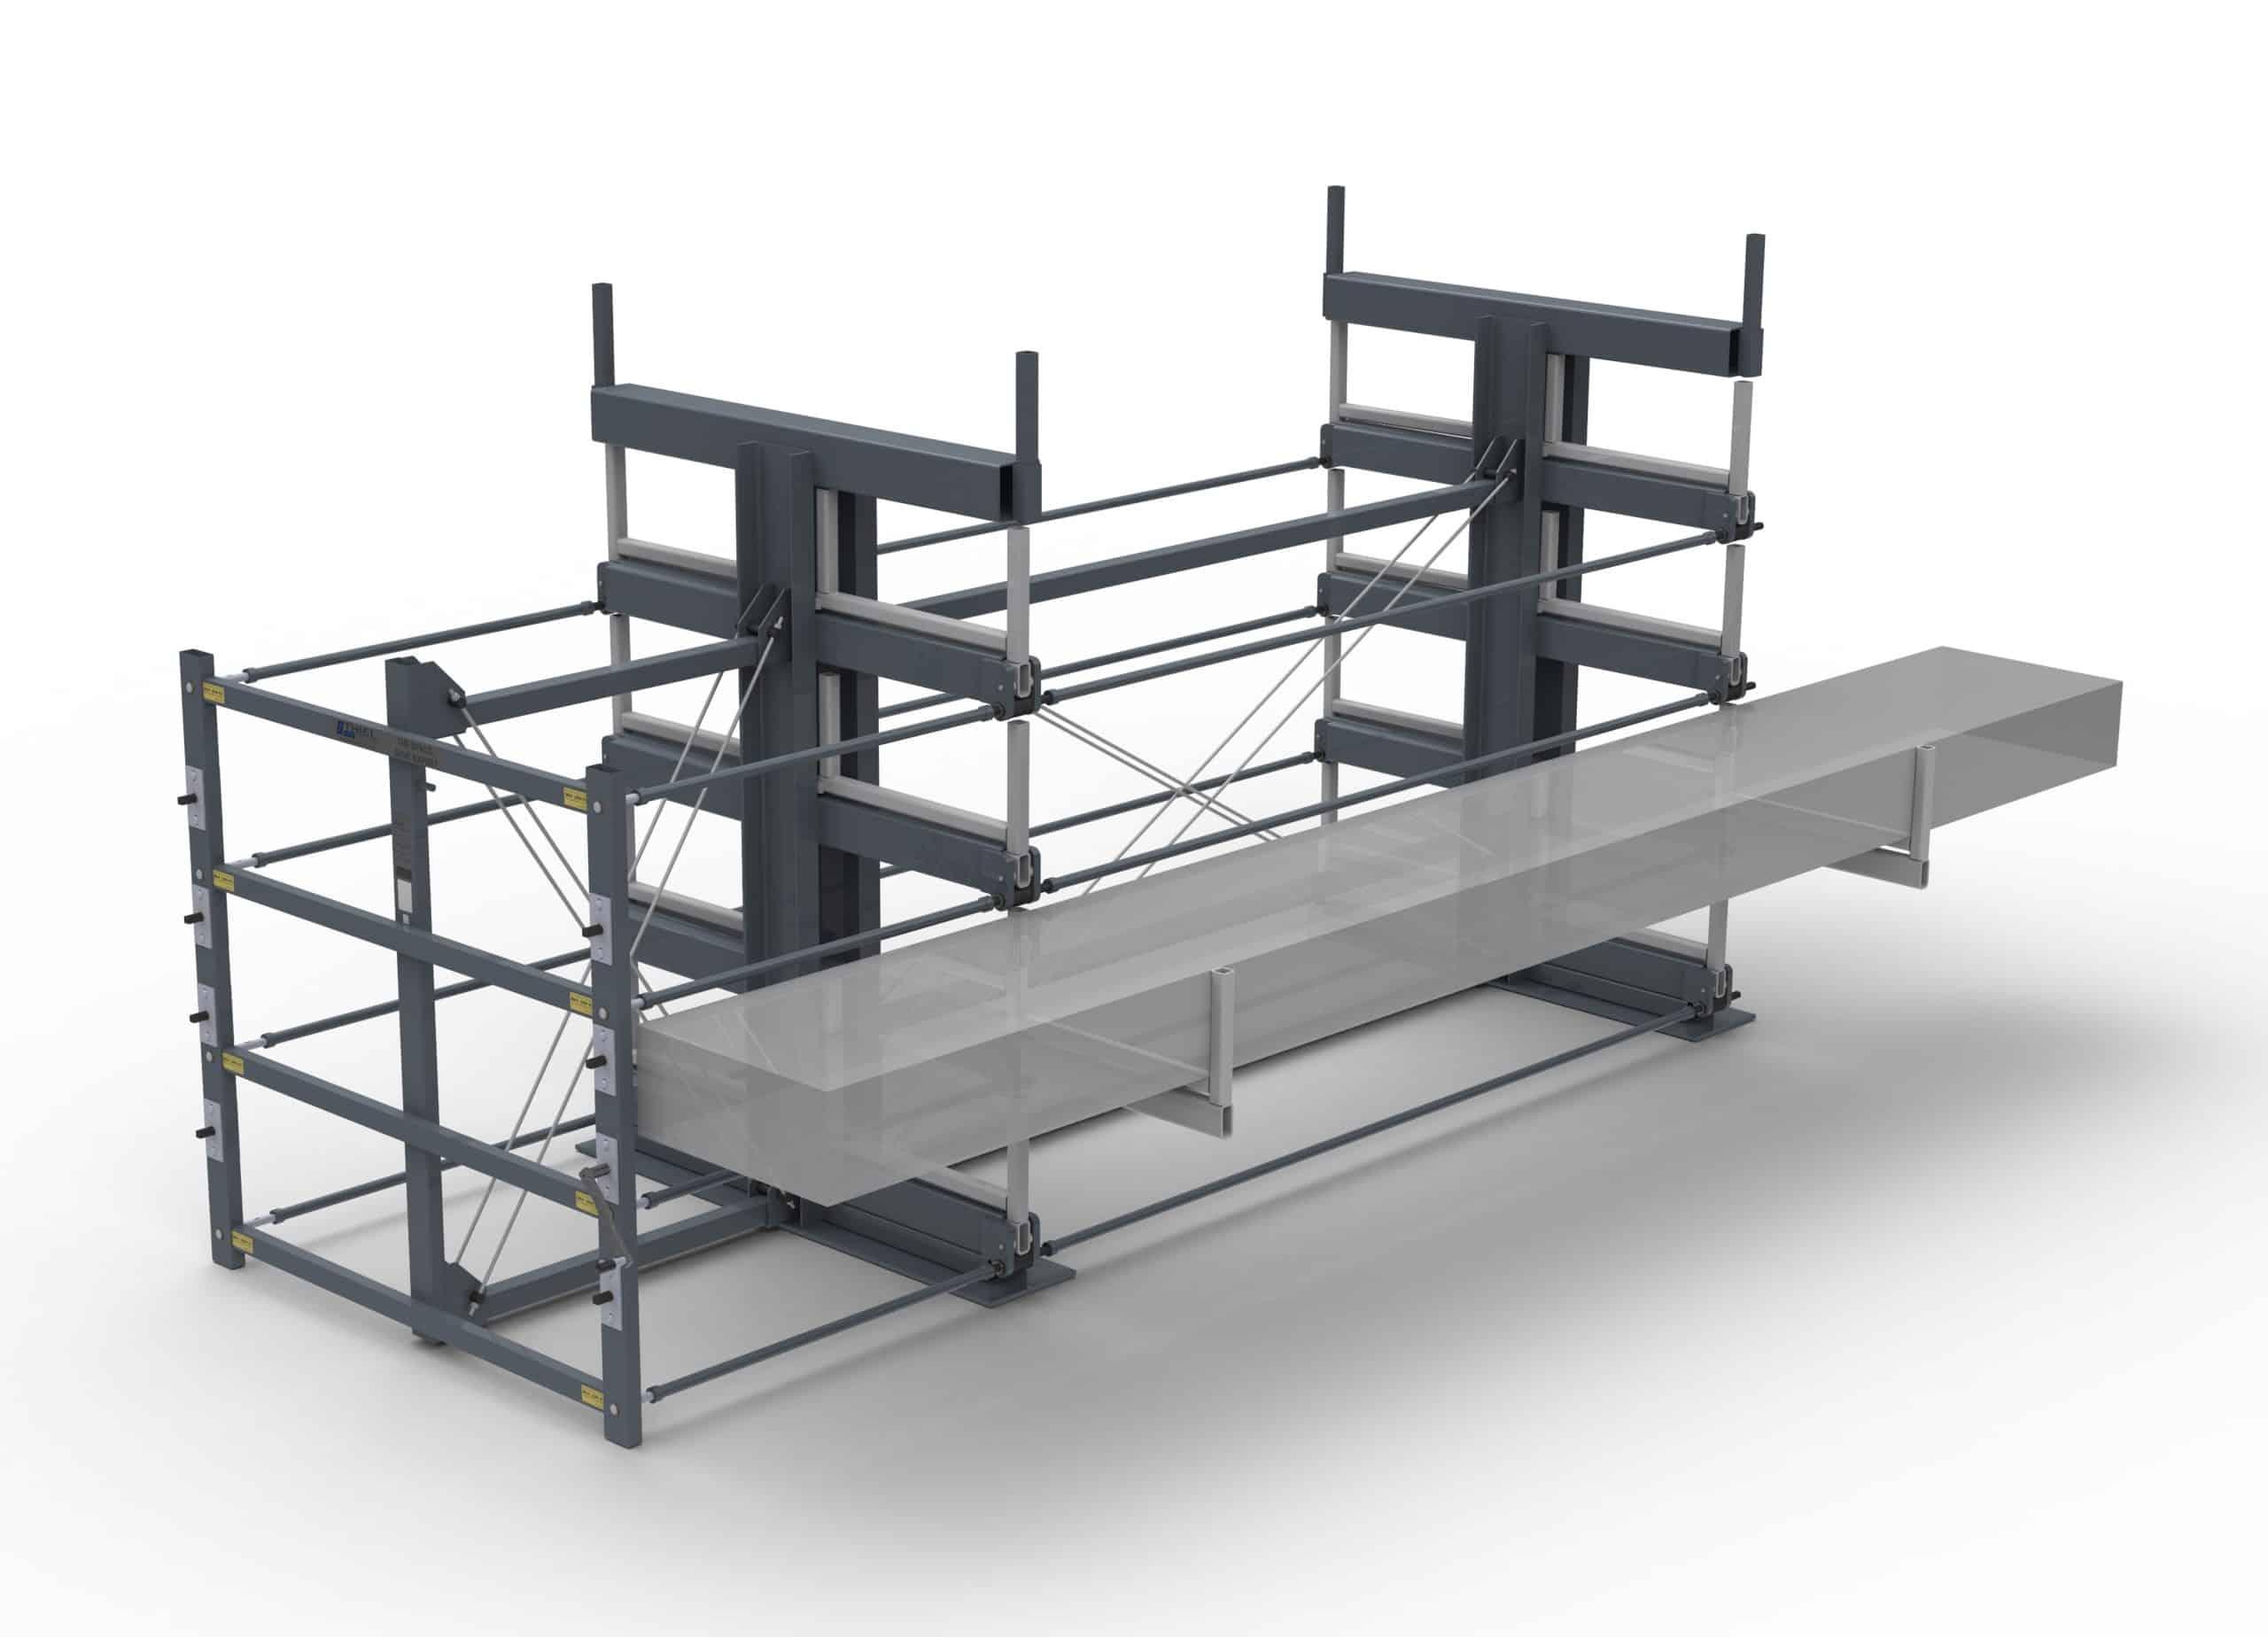 Roll-aus-Regal für Langgut JUMBO-4E-2G-92×20 ML=3000mm – Ausrollbares Kragarmregal